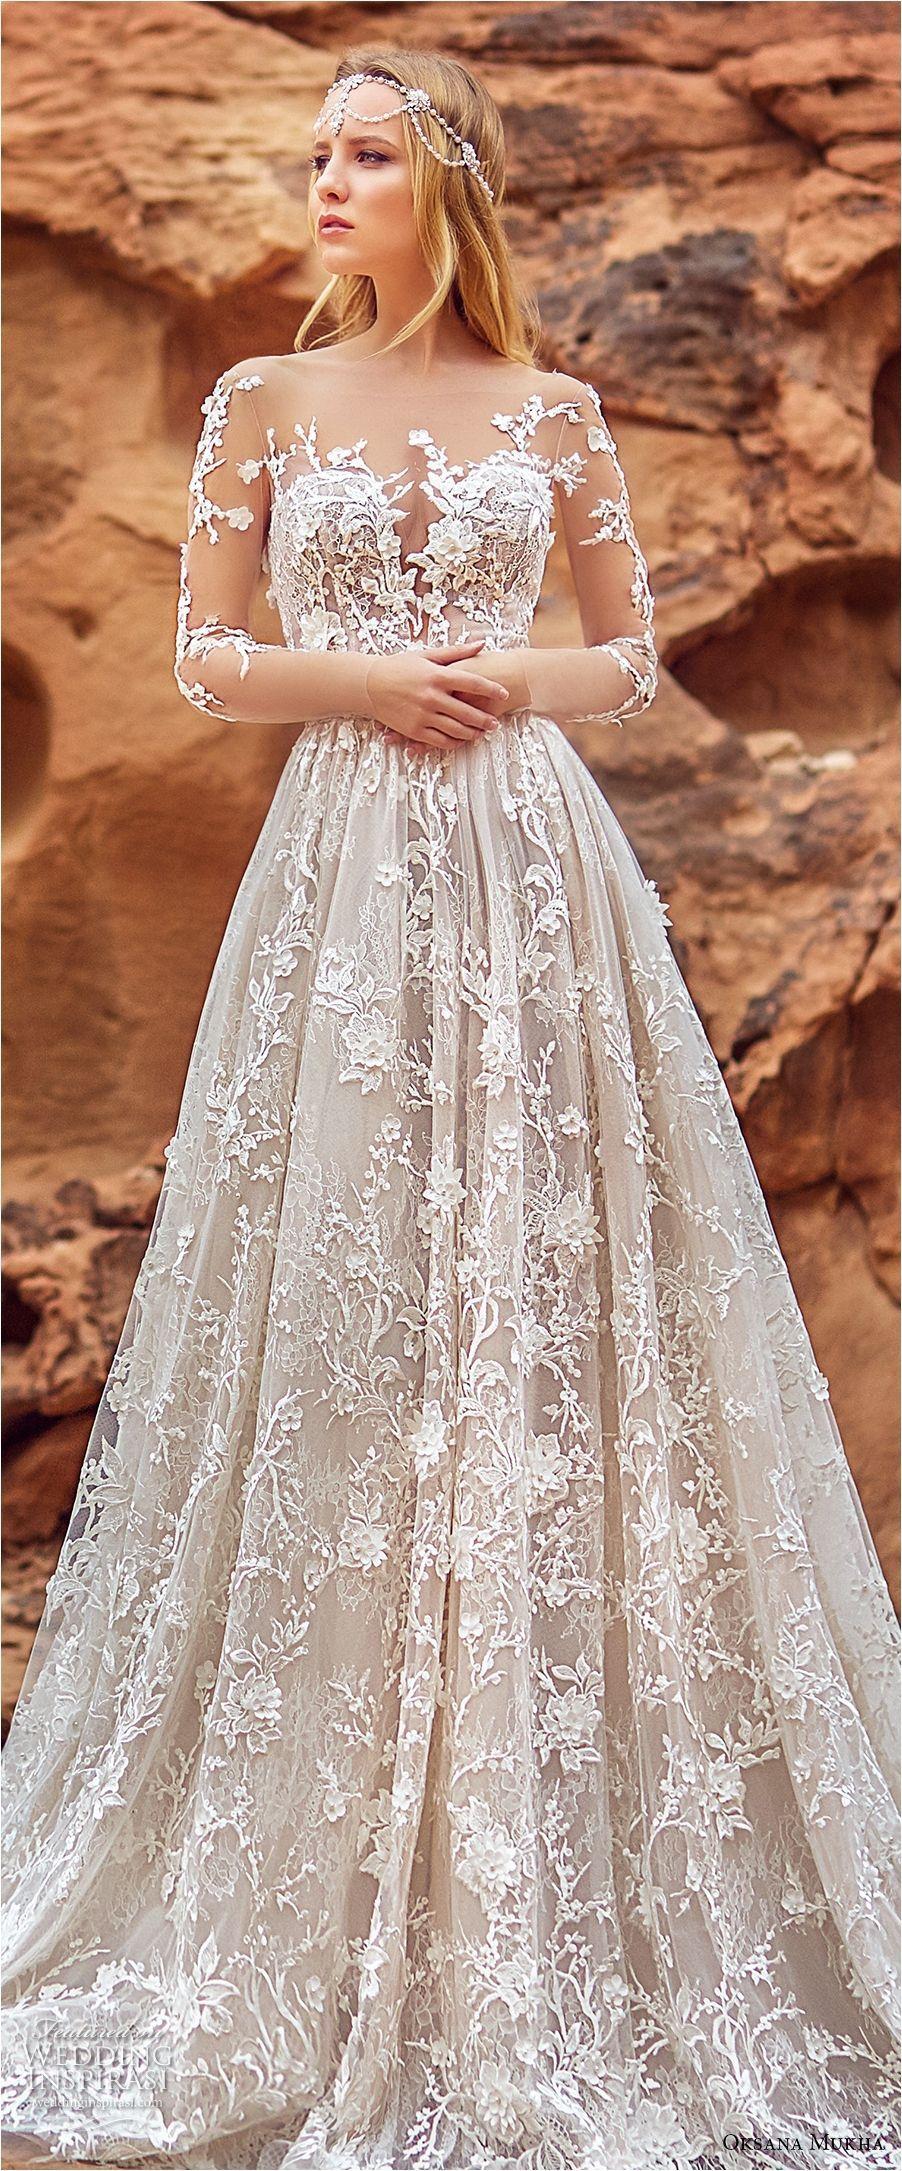 Pin by Ashley Marie Smith on Cute Weddings  Wedding Wedding dresses Wedding dress sleeves